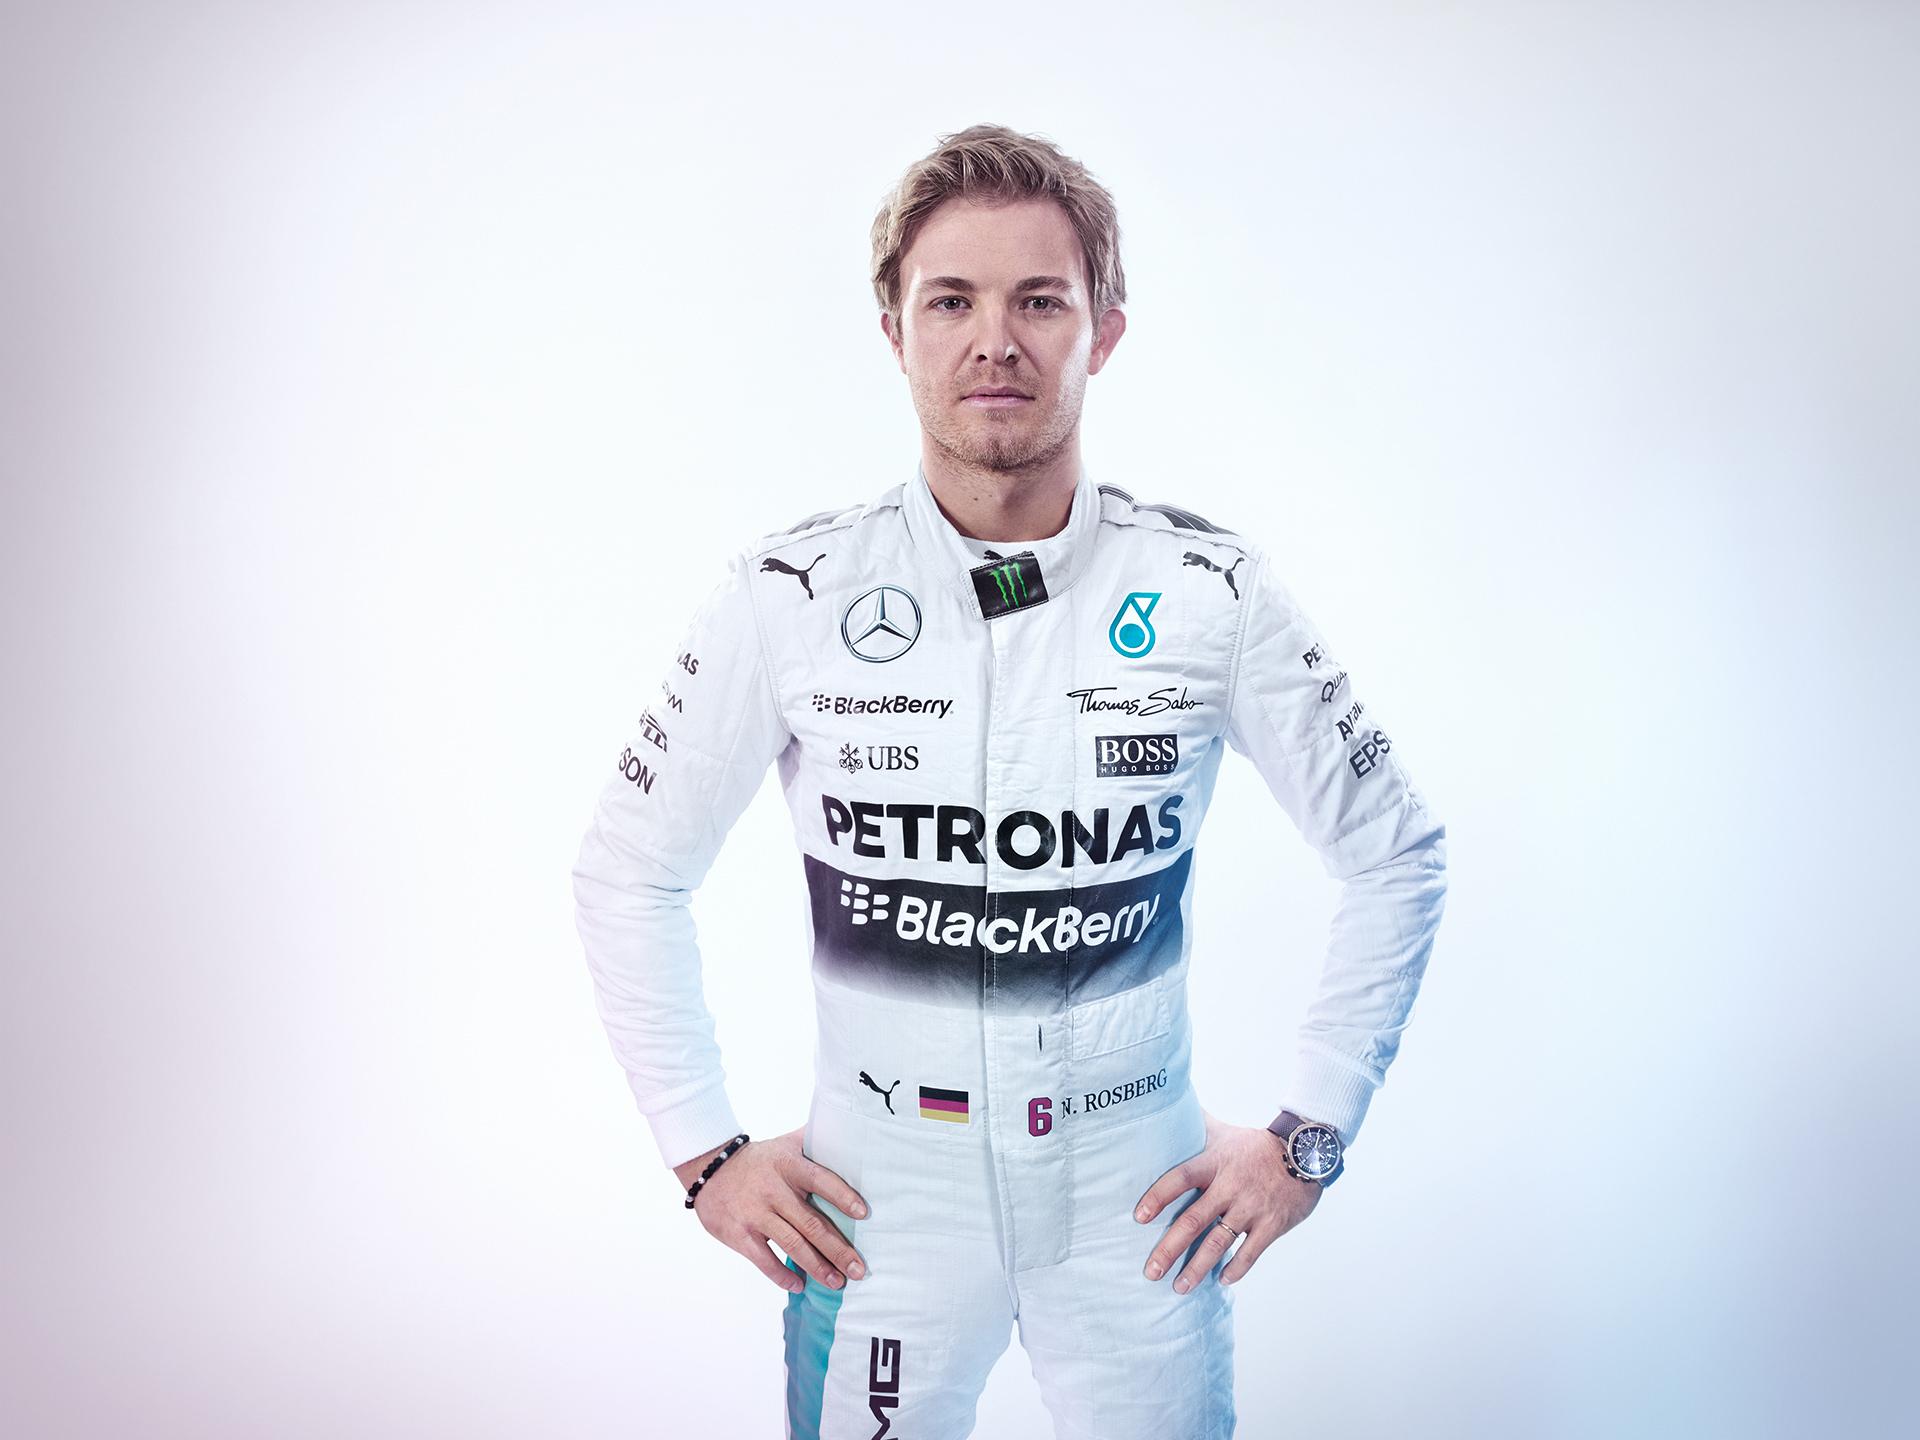 Mercedes Benz, Formel 1, F1, Barcelona, circuit de catalunya, spain, amg, nico rosberg, Anke Luckmann, www.ankeluckmann.com, trey